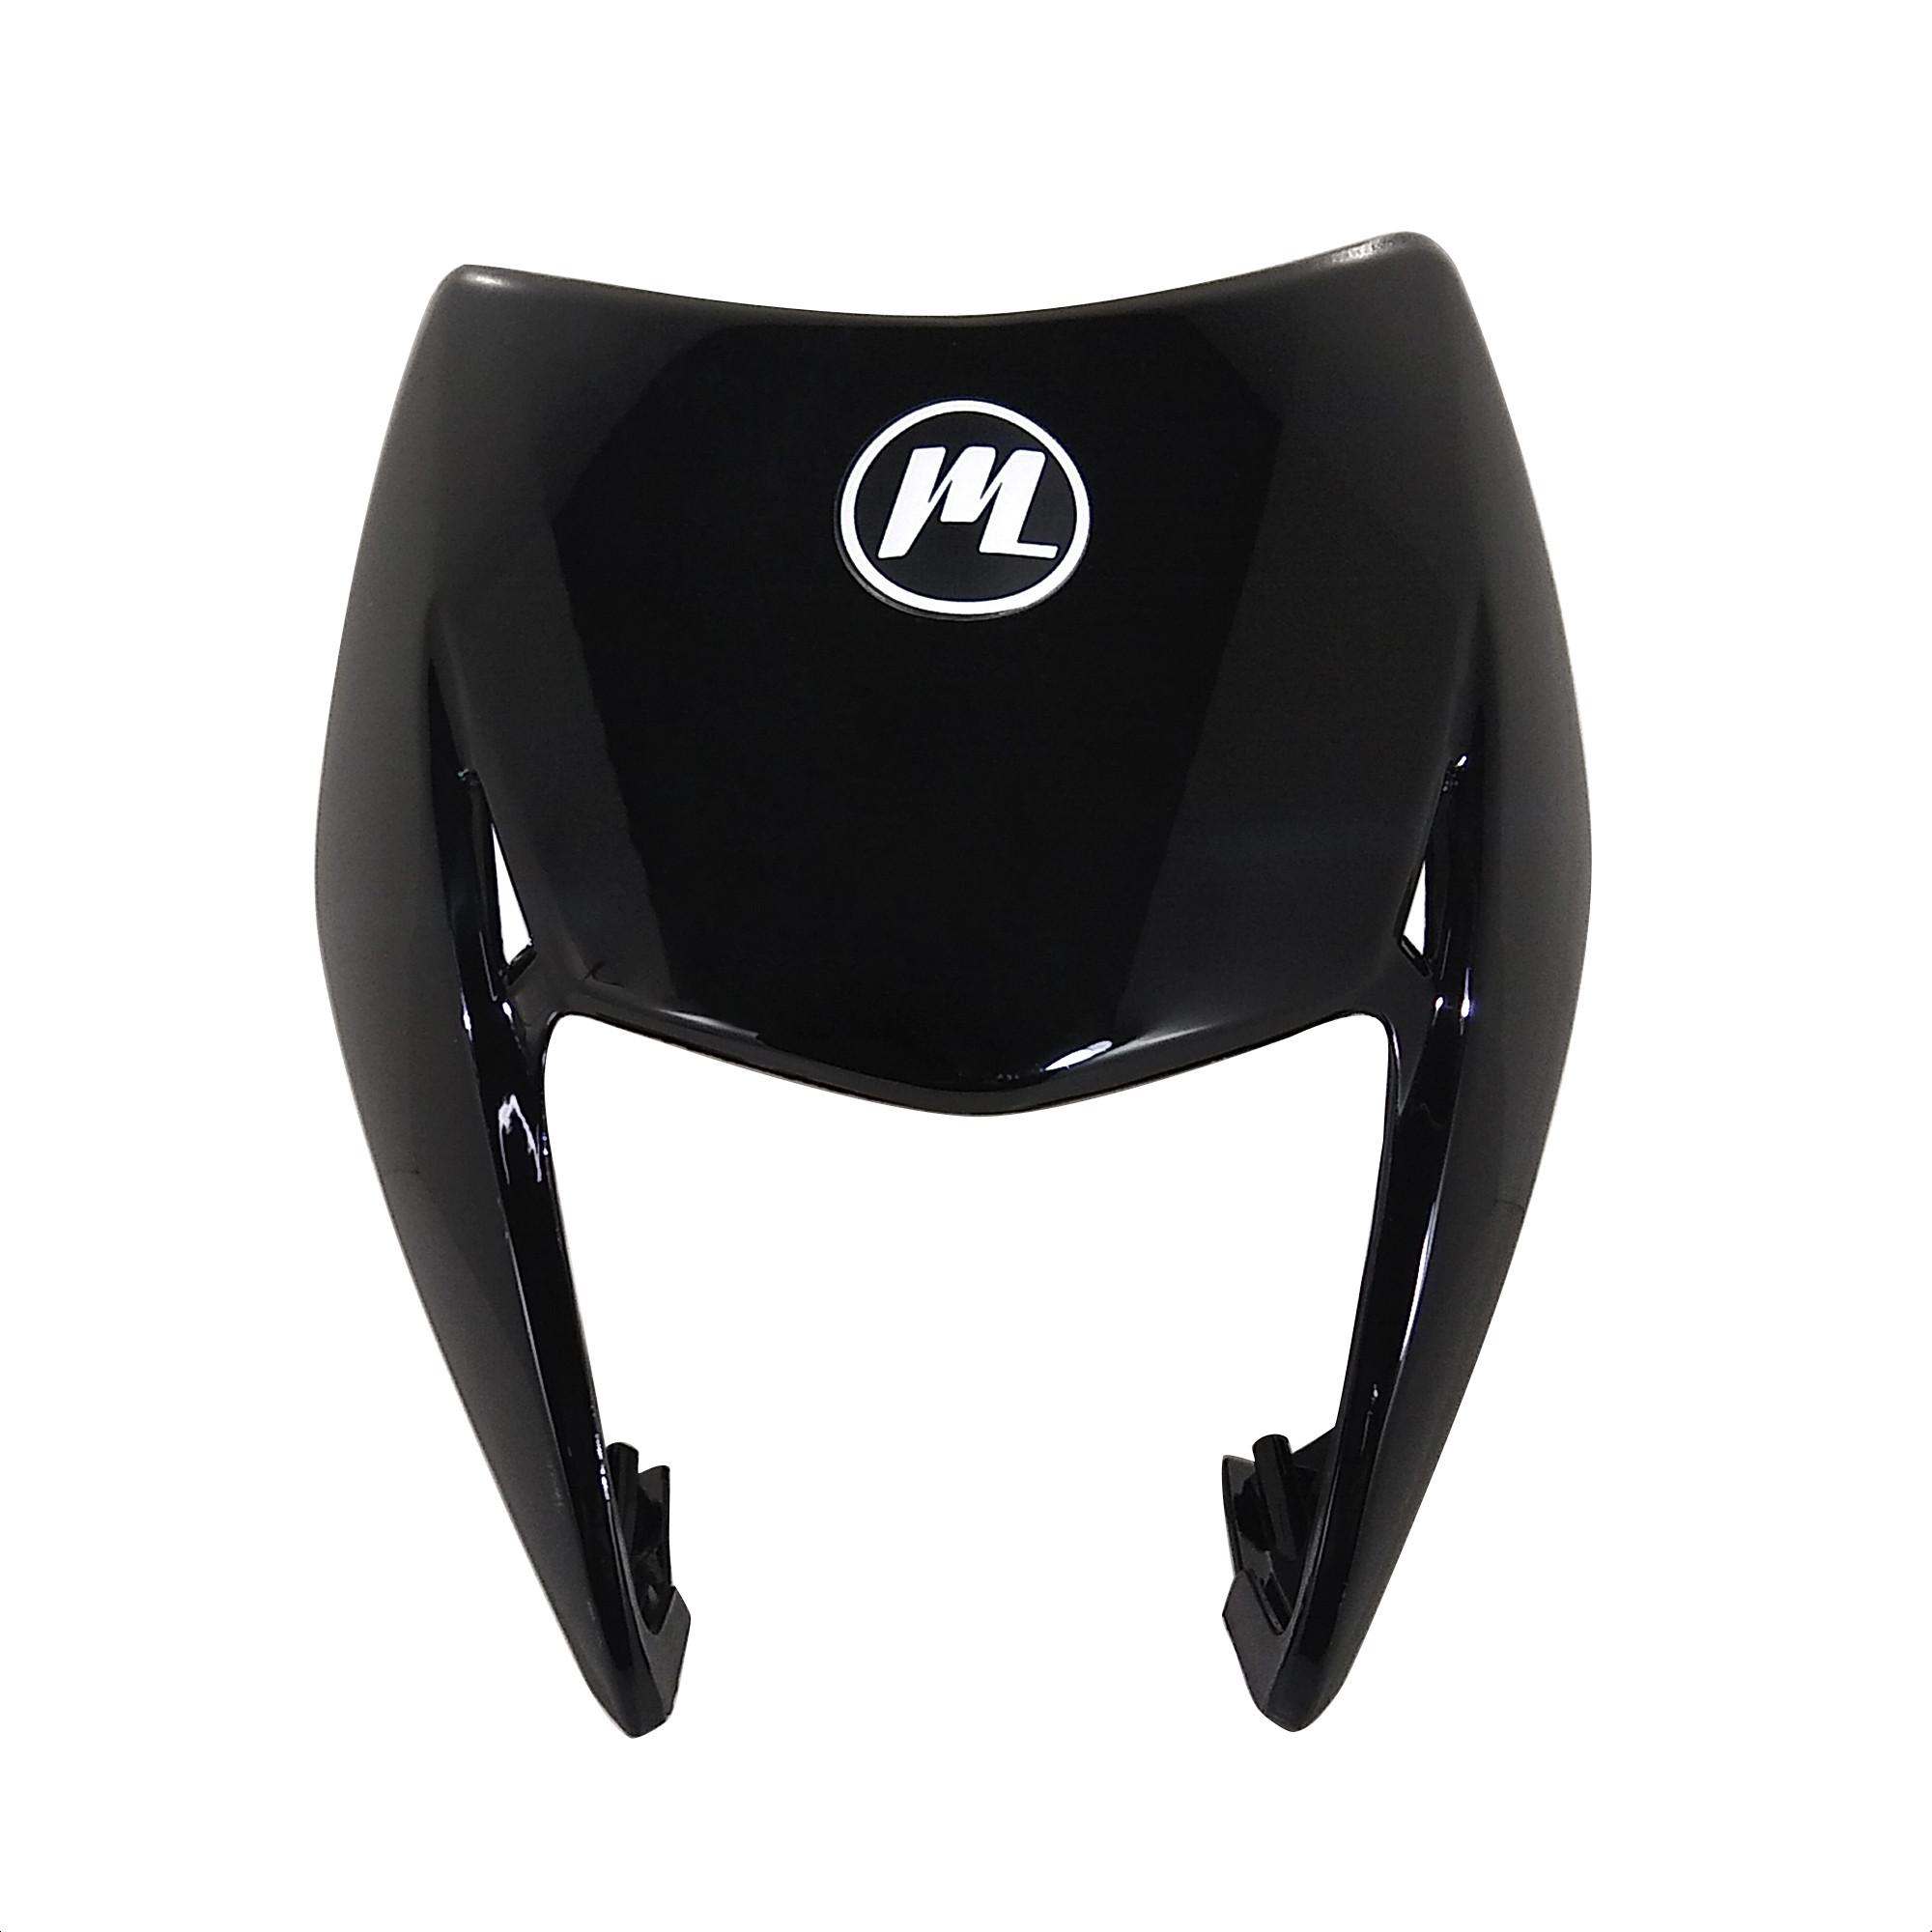 Mascara Optica Negro Motomel Skua 150 Modelo Nuevo Original